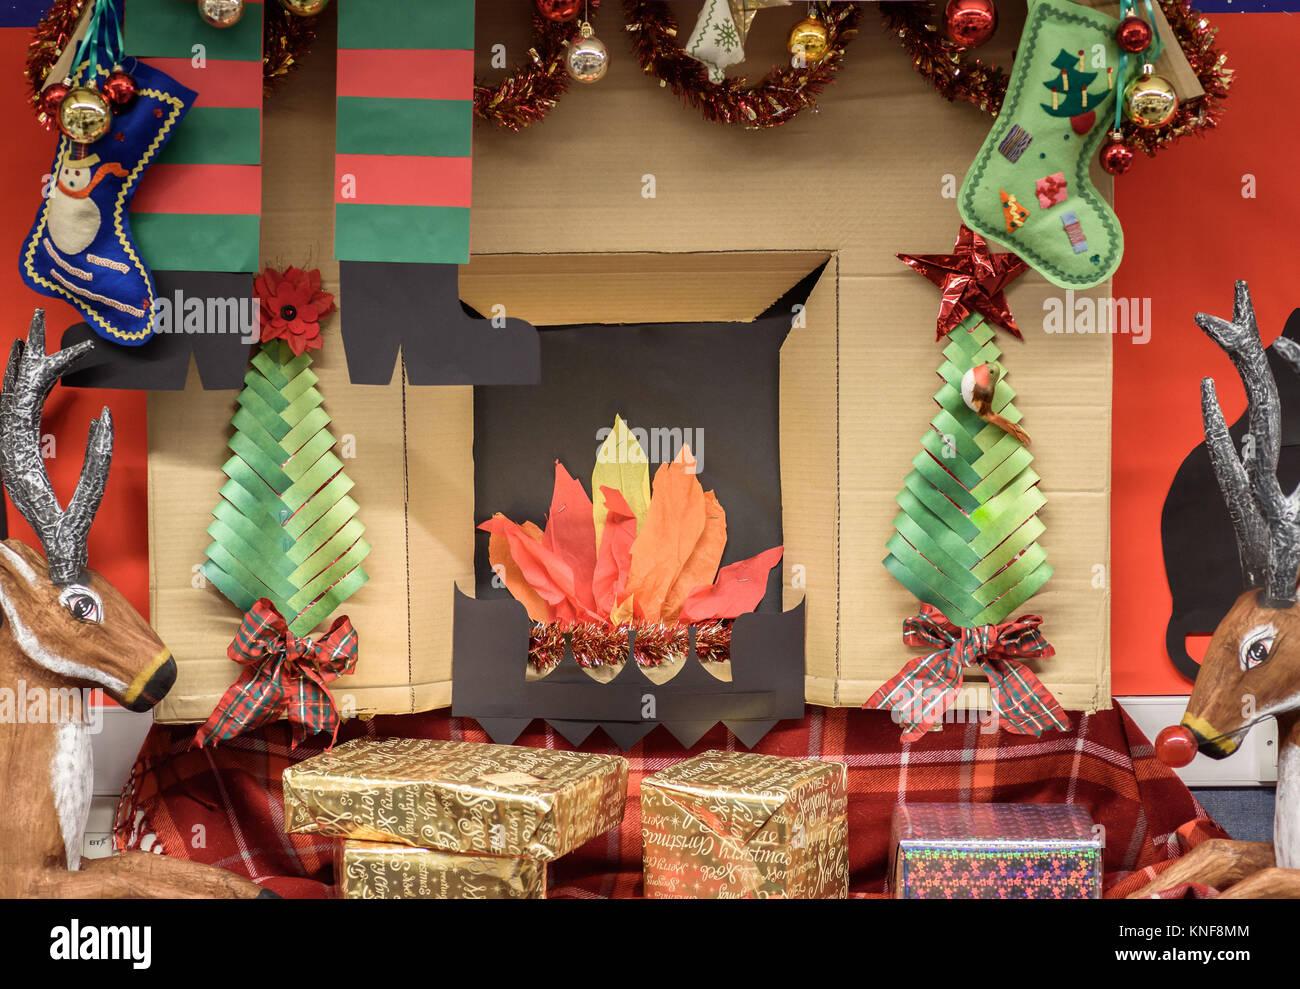 Cardboard Christmas Fireplace.A Handmade Christmas Fireplace Display Made From Cardboard